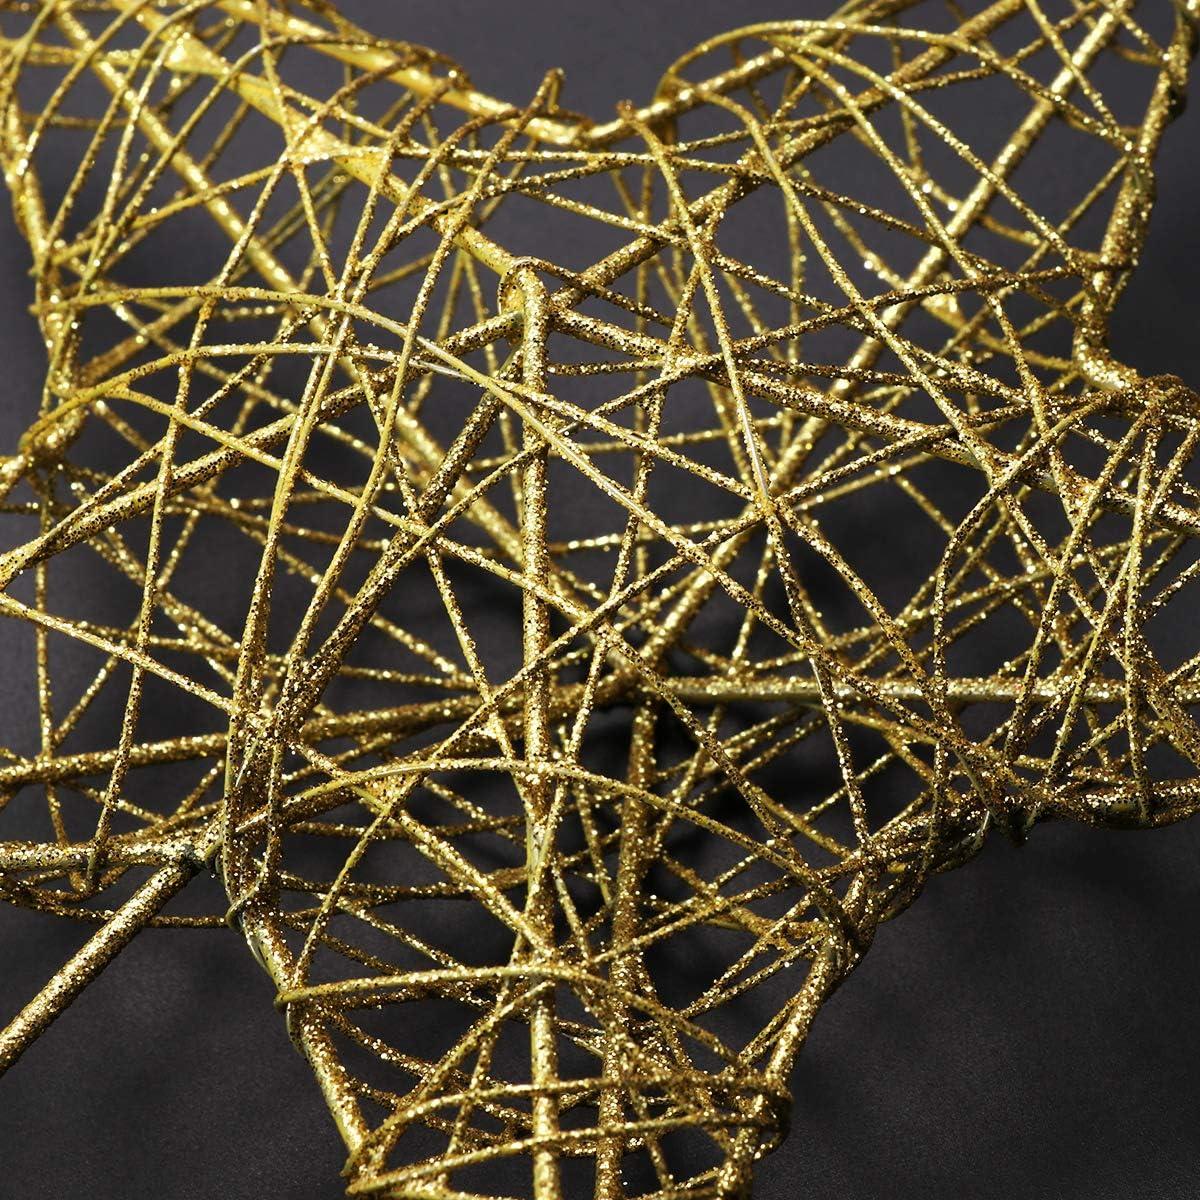 Christmas Star Tree Topper, Gold Glittered Metal Hollow Tree Star himmery Tree Topper for Christmas Tree Decor